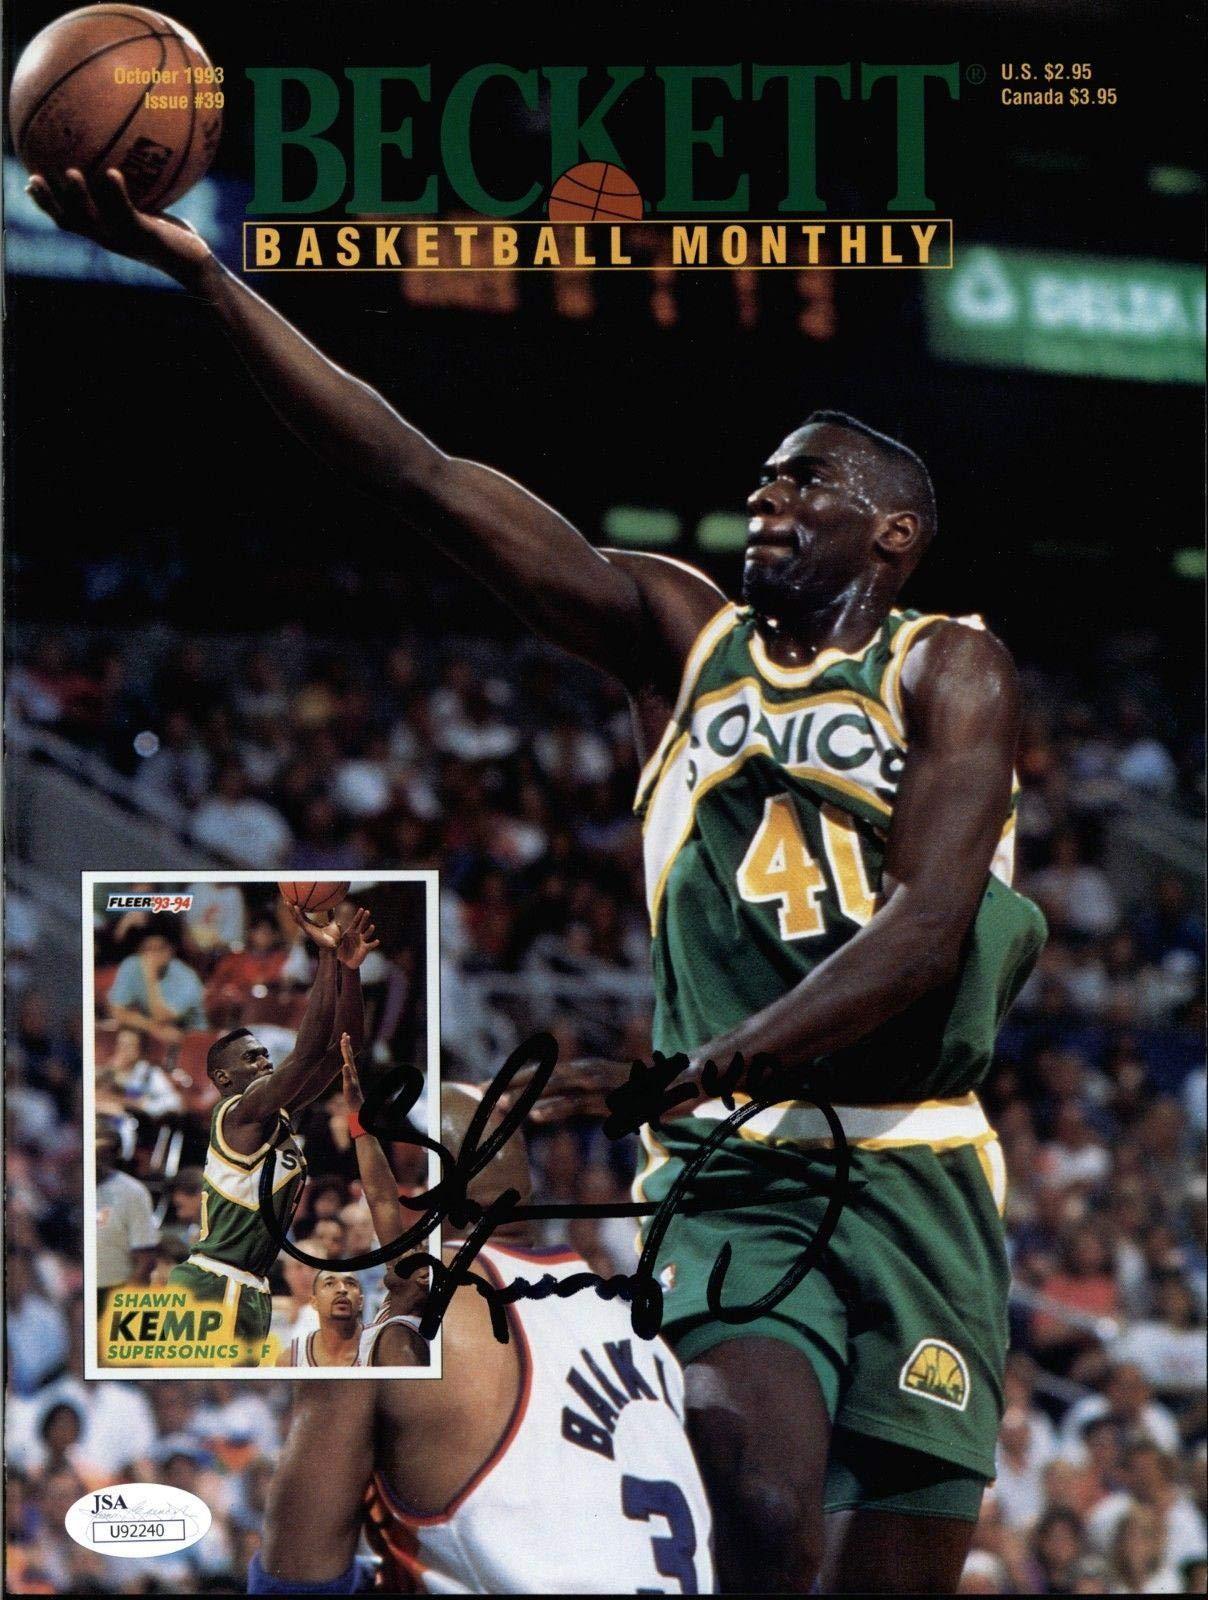 Shawn Kemp Sonics Signed 1993 Beckett Magazine COA JSA Certified Autographed NBA Magazines